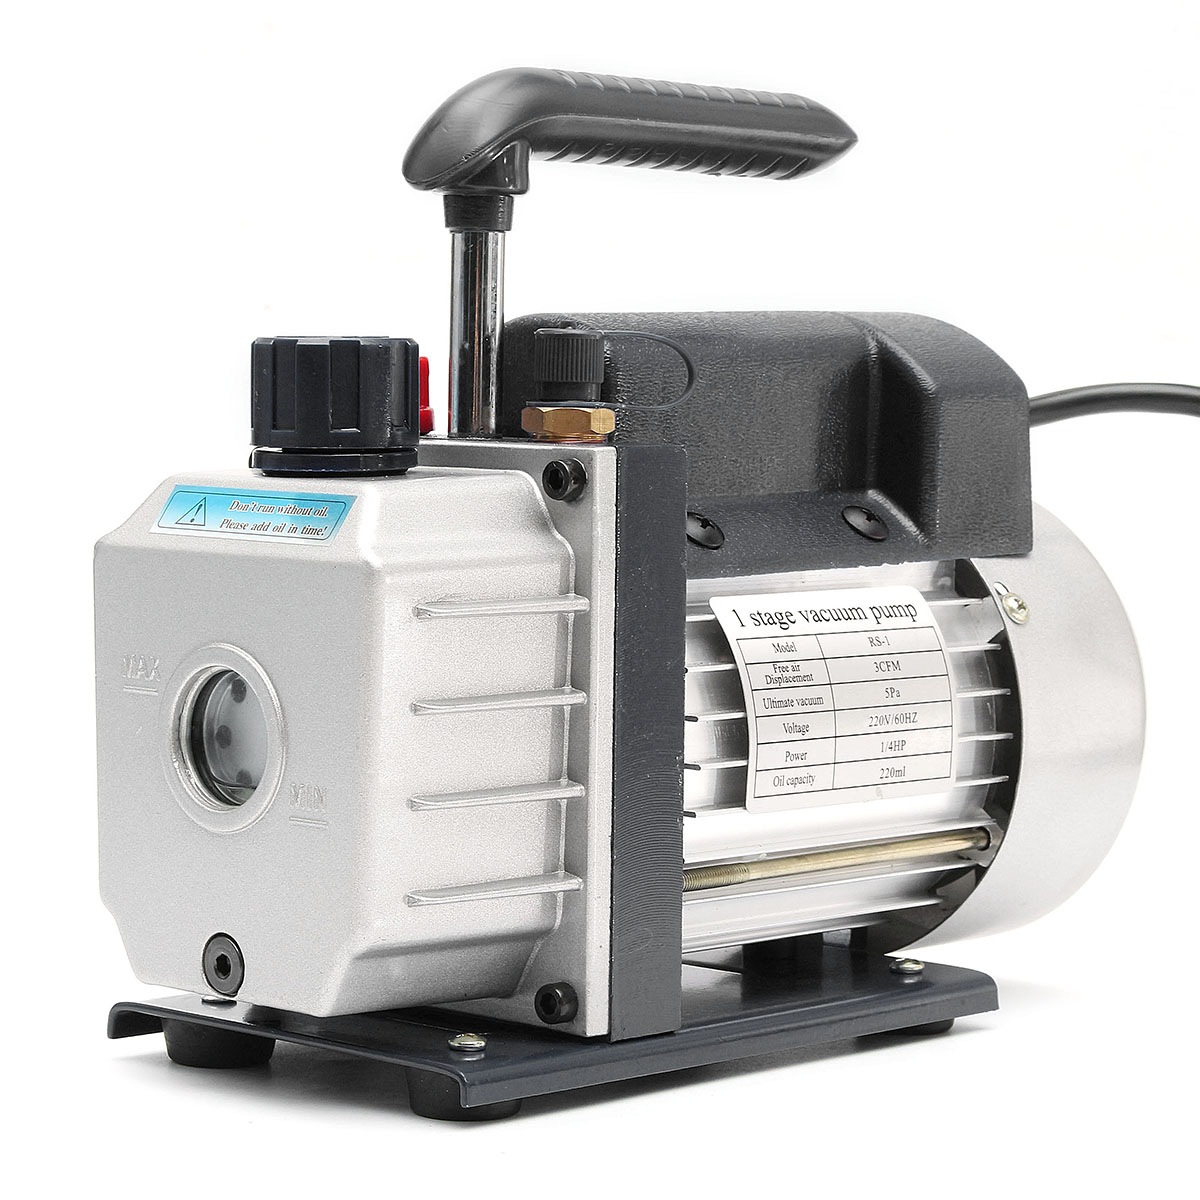 220V 180W 60HZ 3CFM Vacuum pump Air conditioni Add fluoride tool Vacuum pump set refrigerant table Refrigerant tube